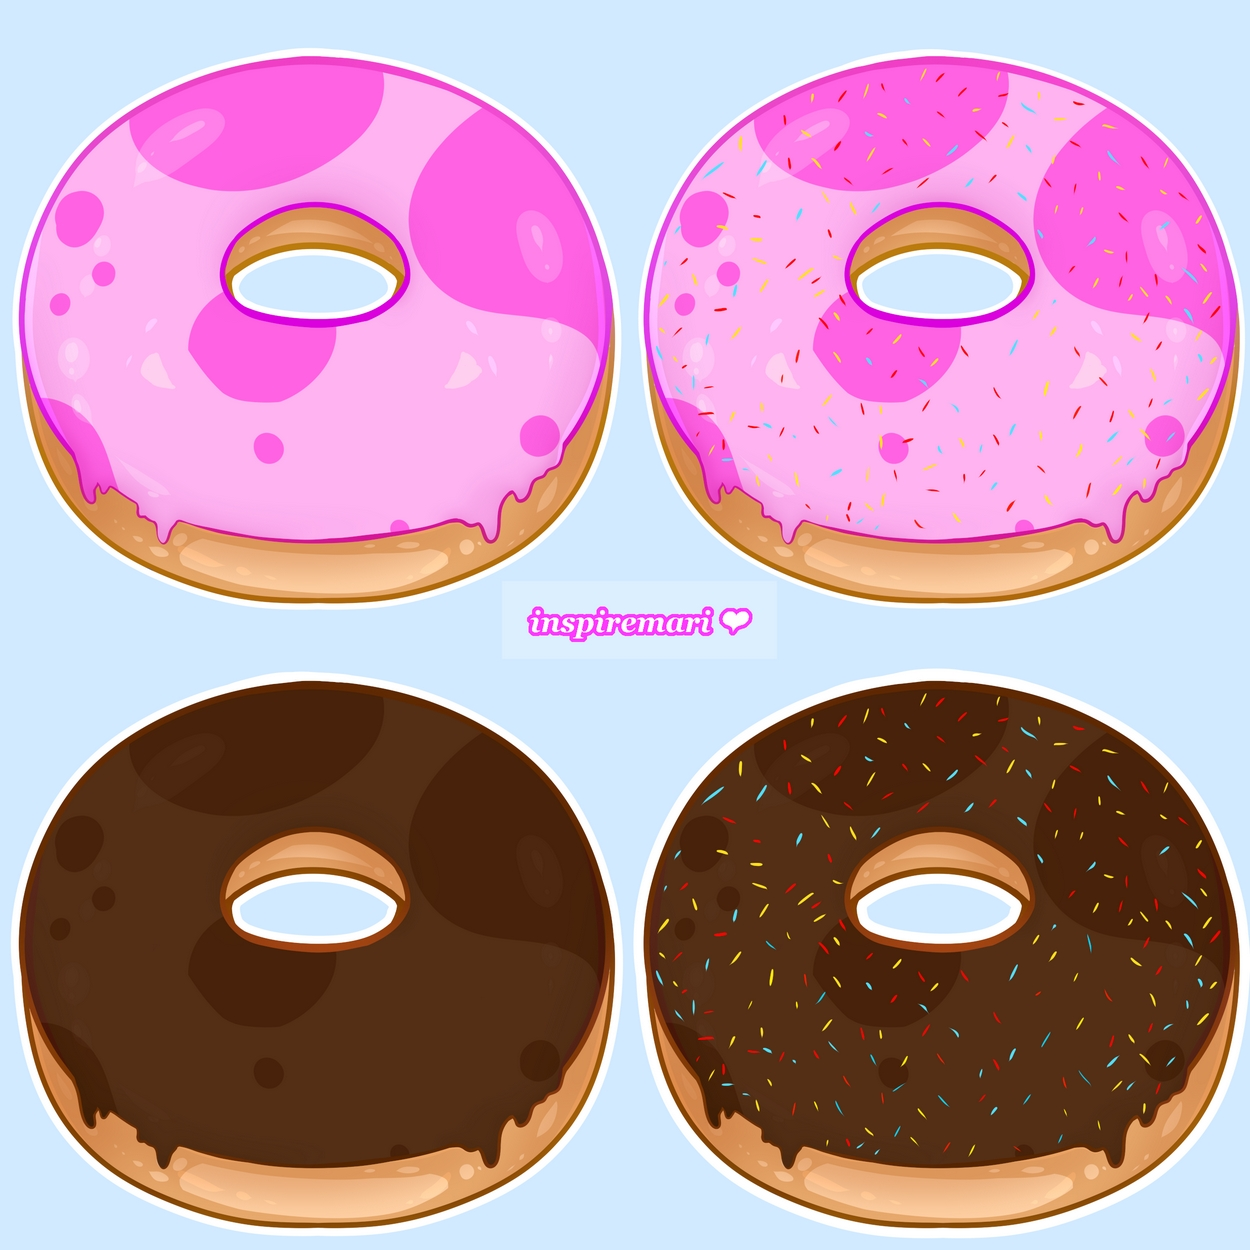 Kawaii Strawberry and Chocolate Donuts